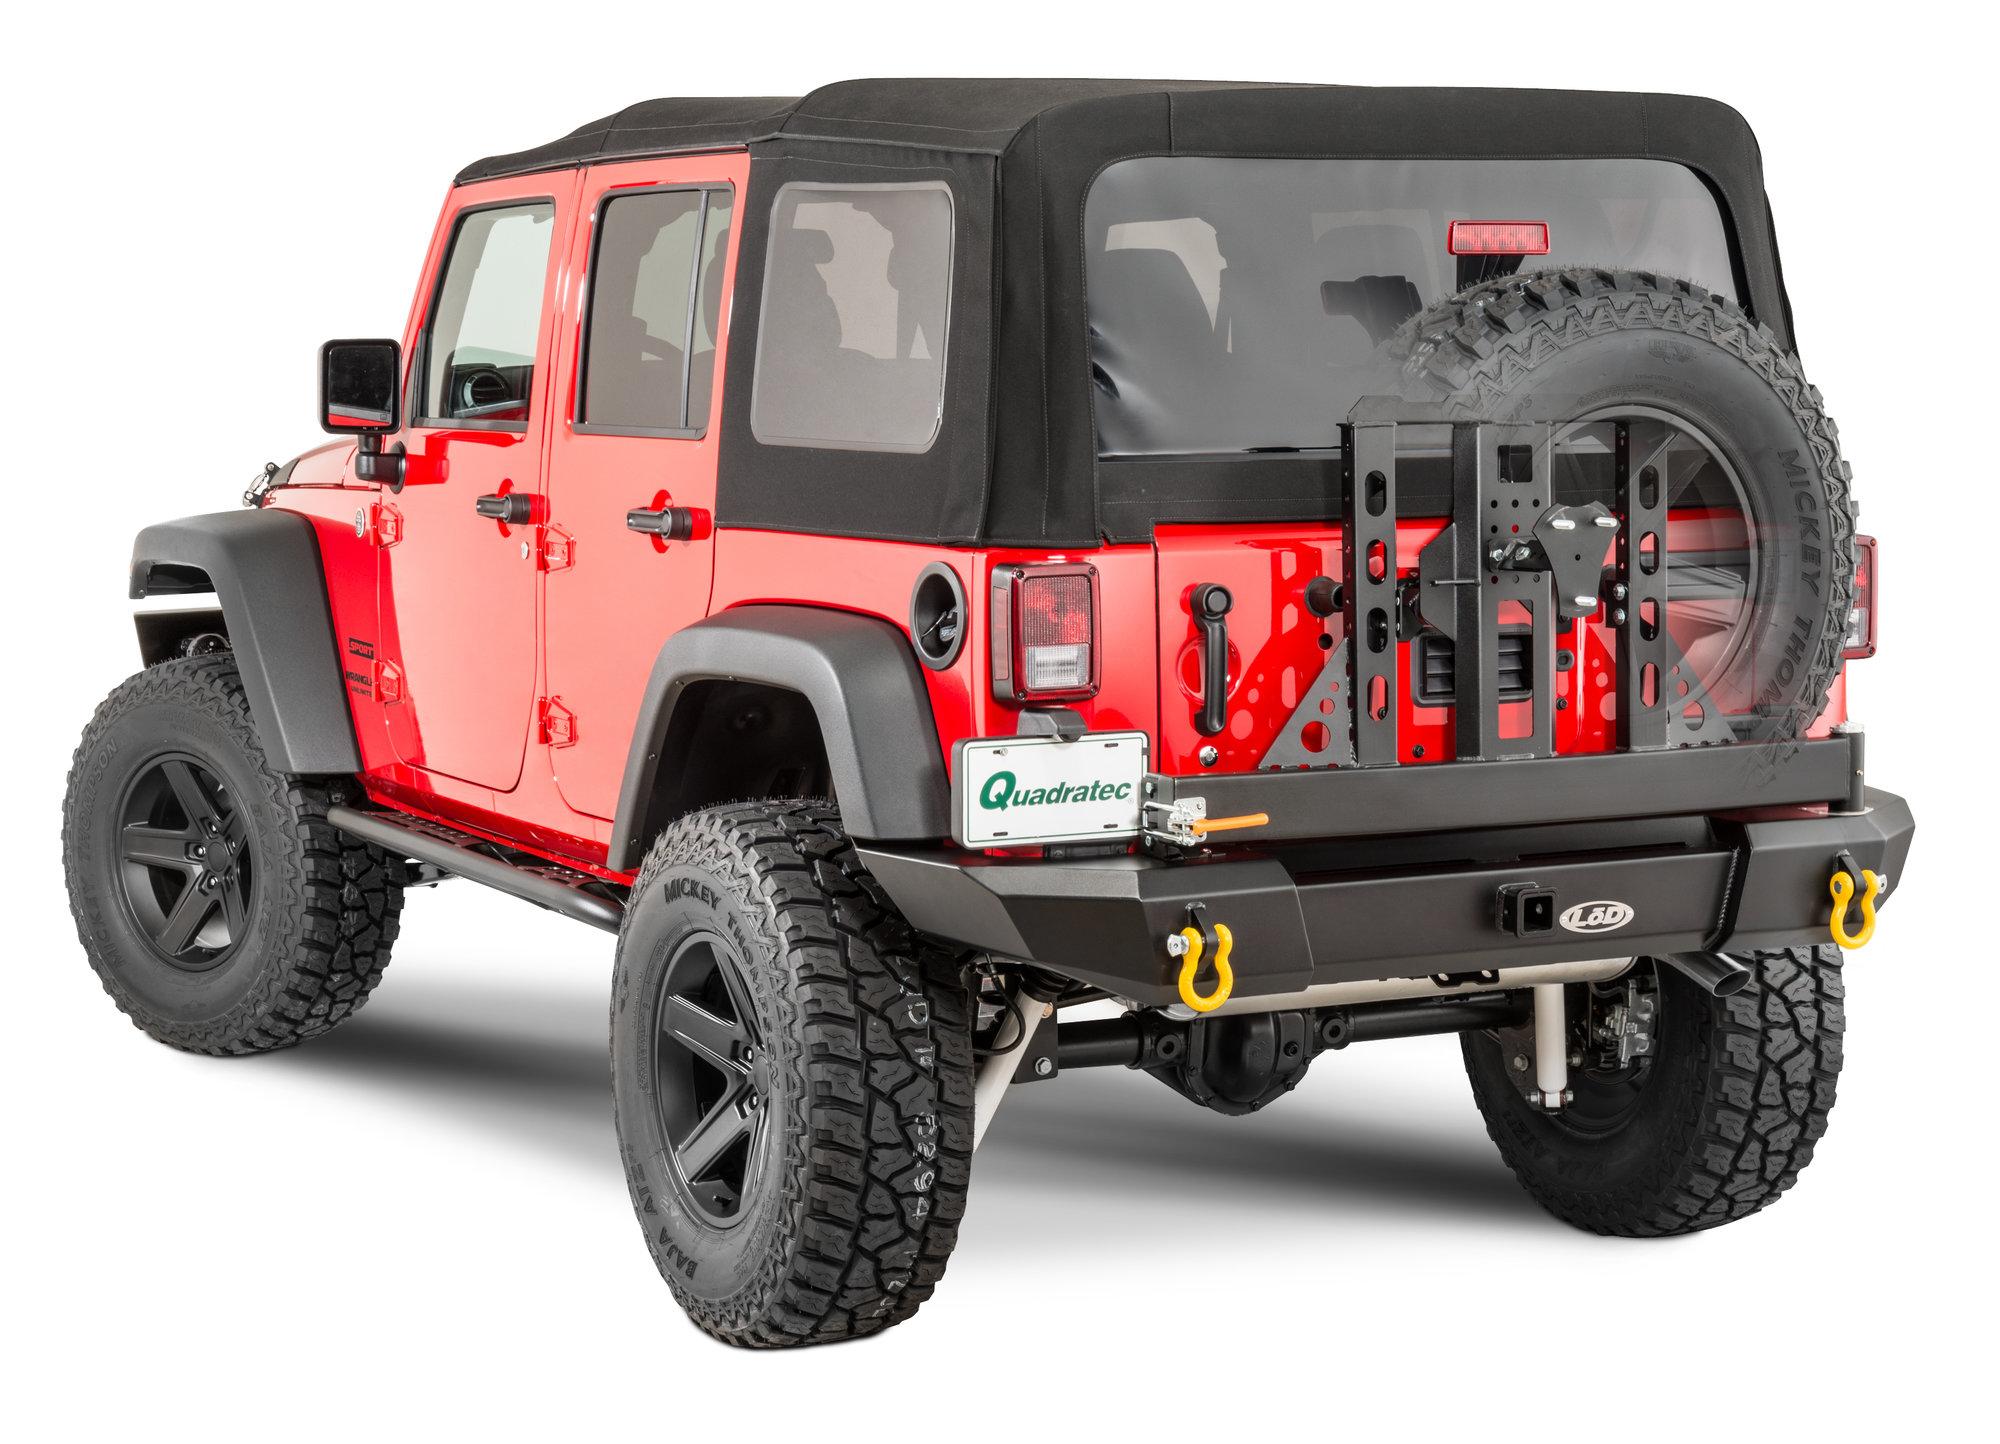 LoD Standard Signature Series Full Width Rear Bumper And